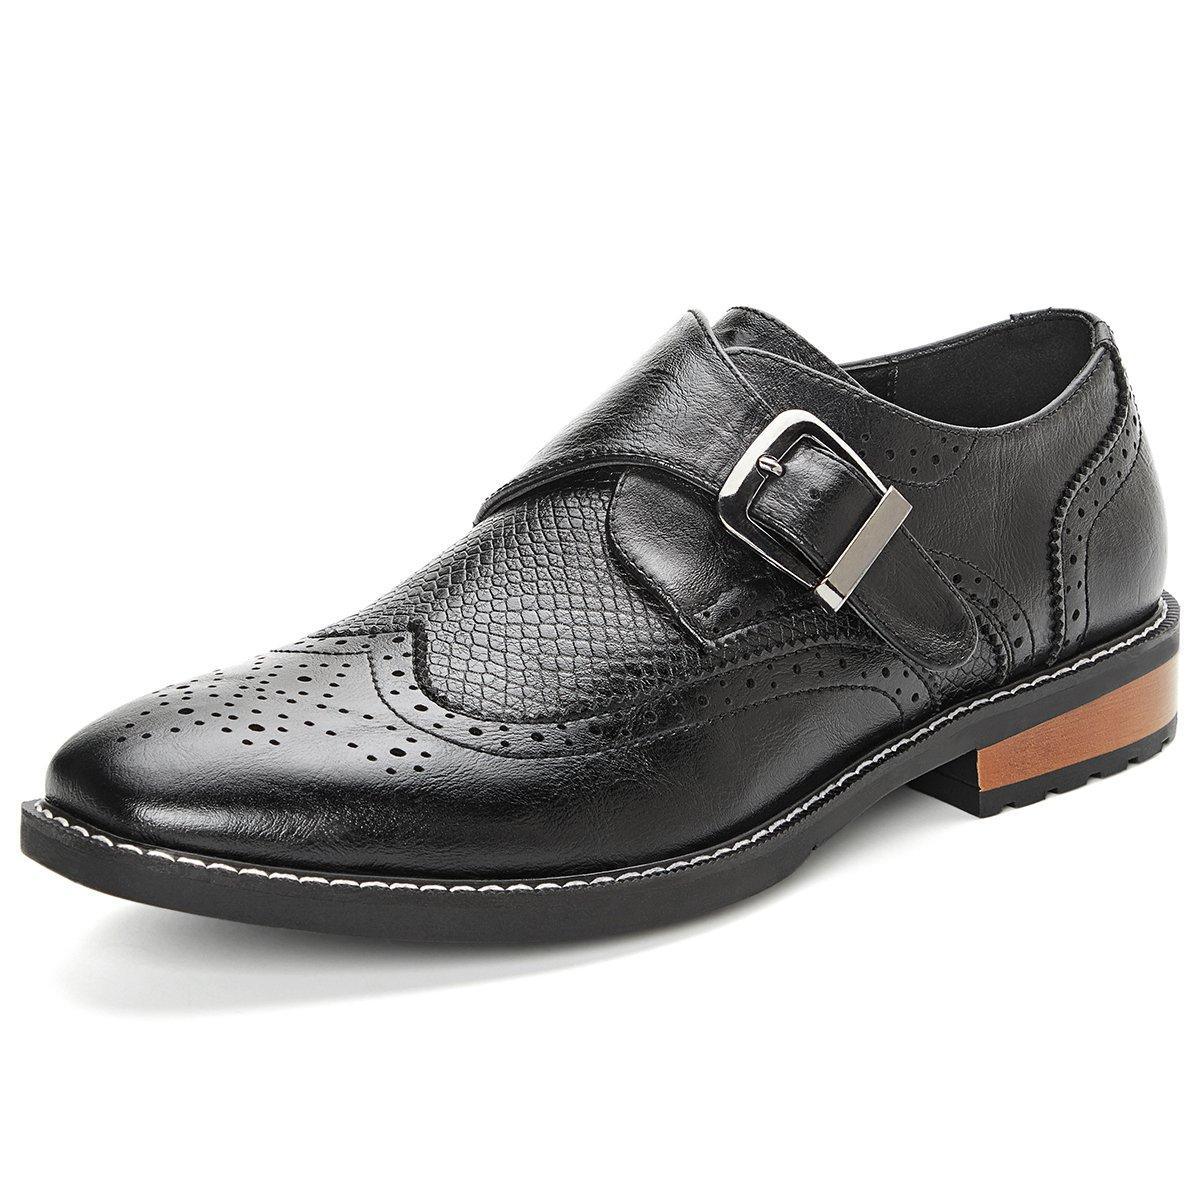 Men's Monk Strap Dress Shoes Wingtip Plaine Toe Single Buckle Slip on Loafer Black 10